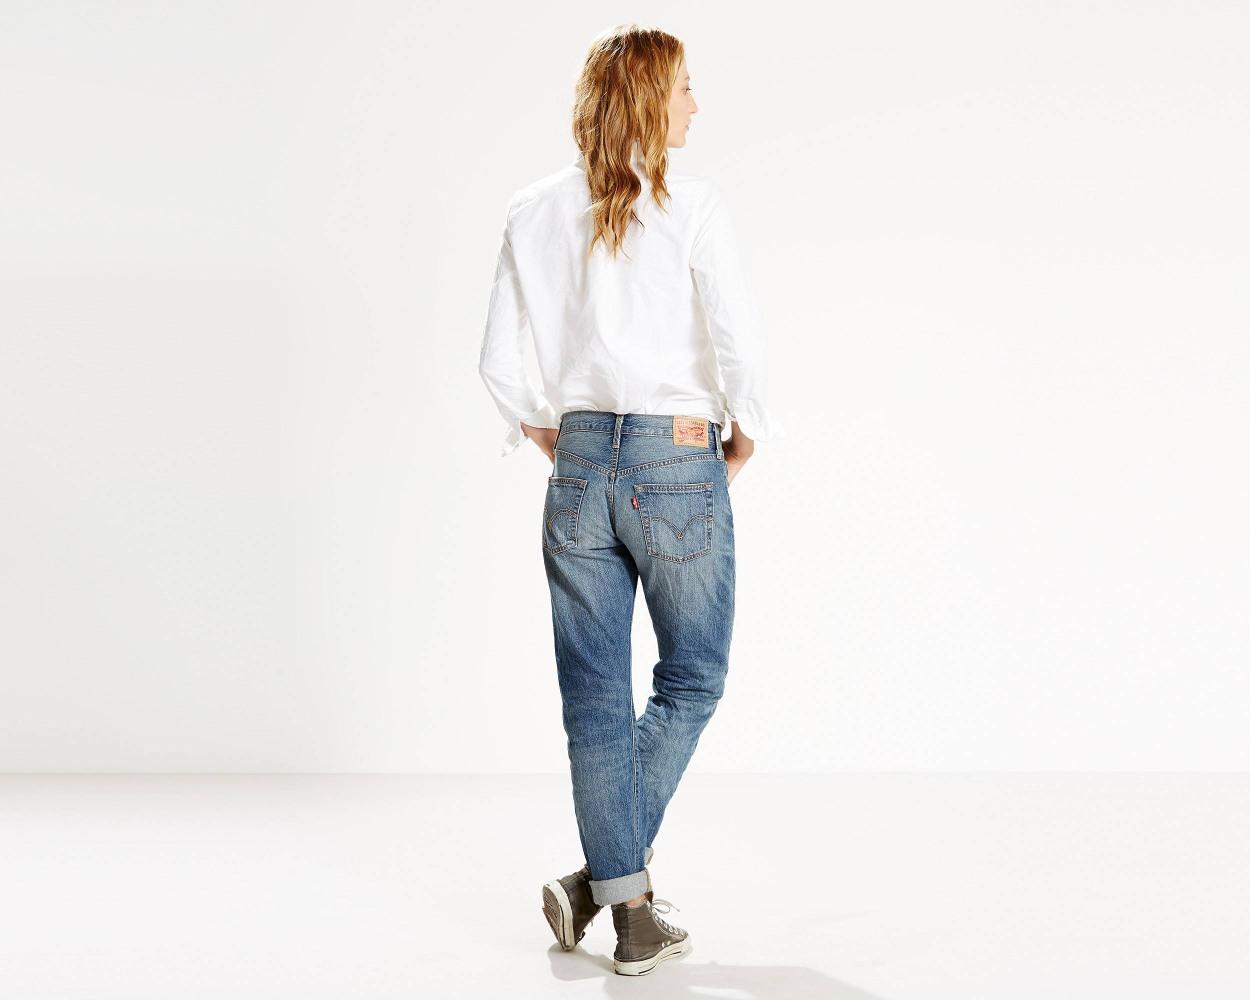 e8339774132 Женские джинсы Levis 501 – True Blue – Интернет магазин одежды Non ...